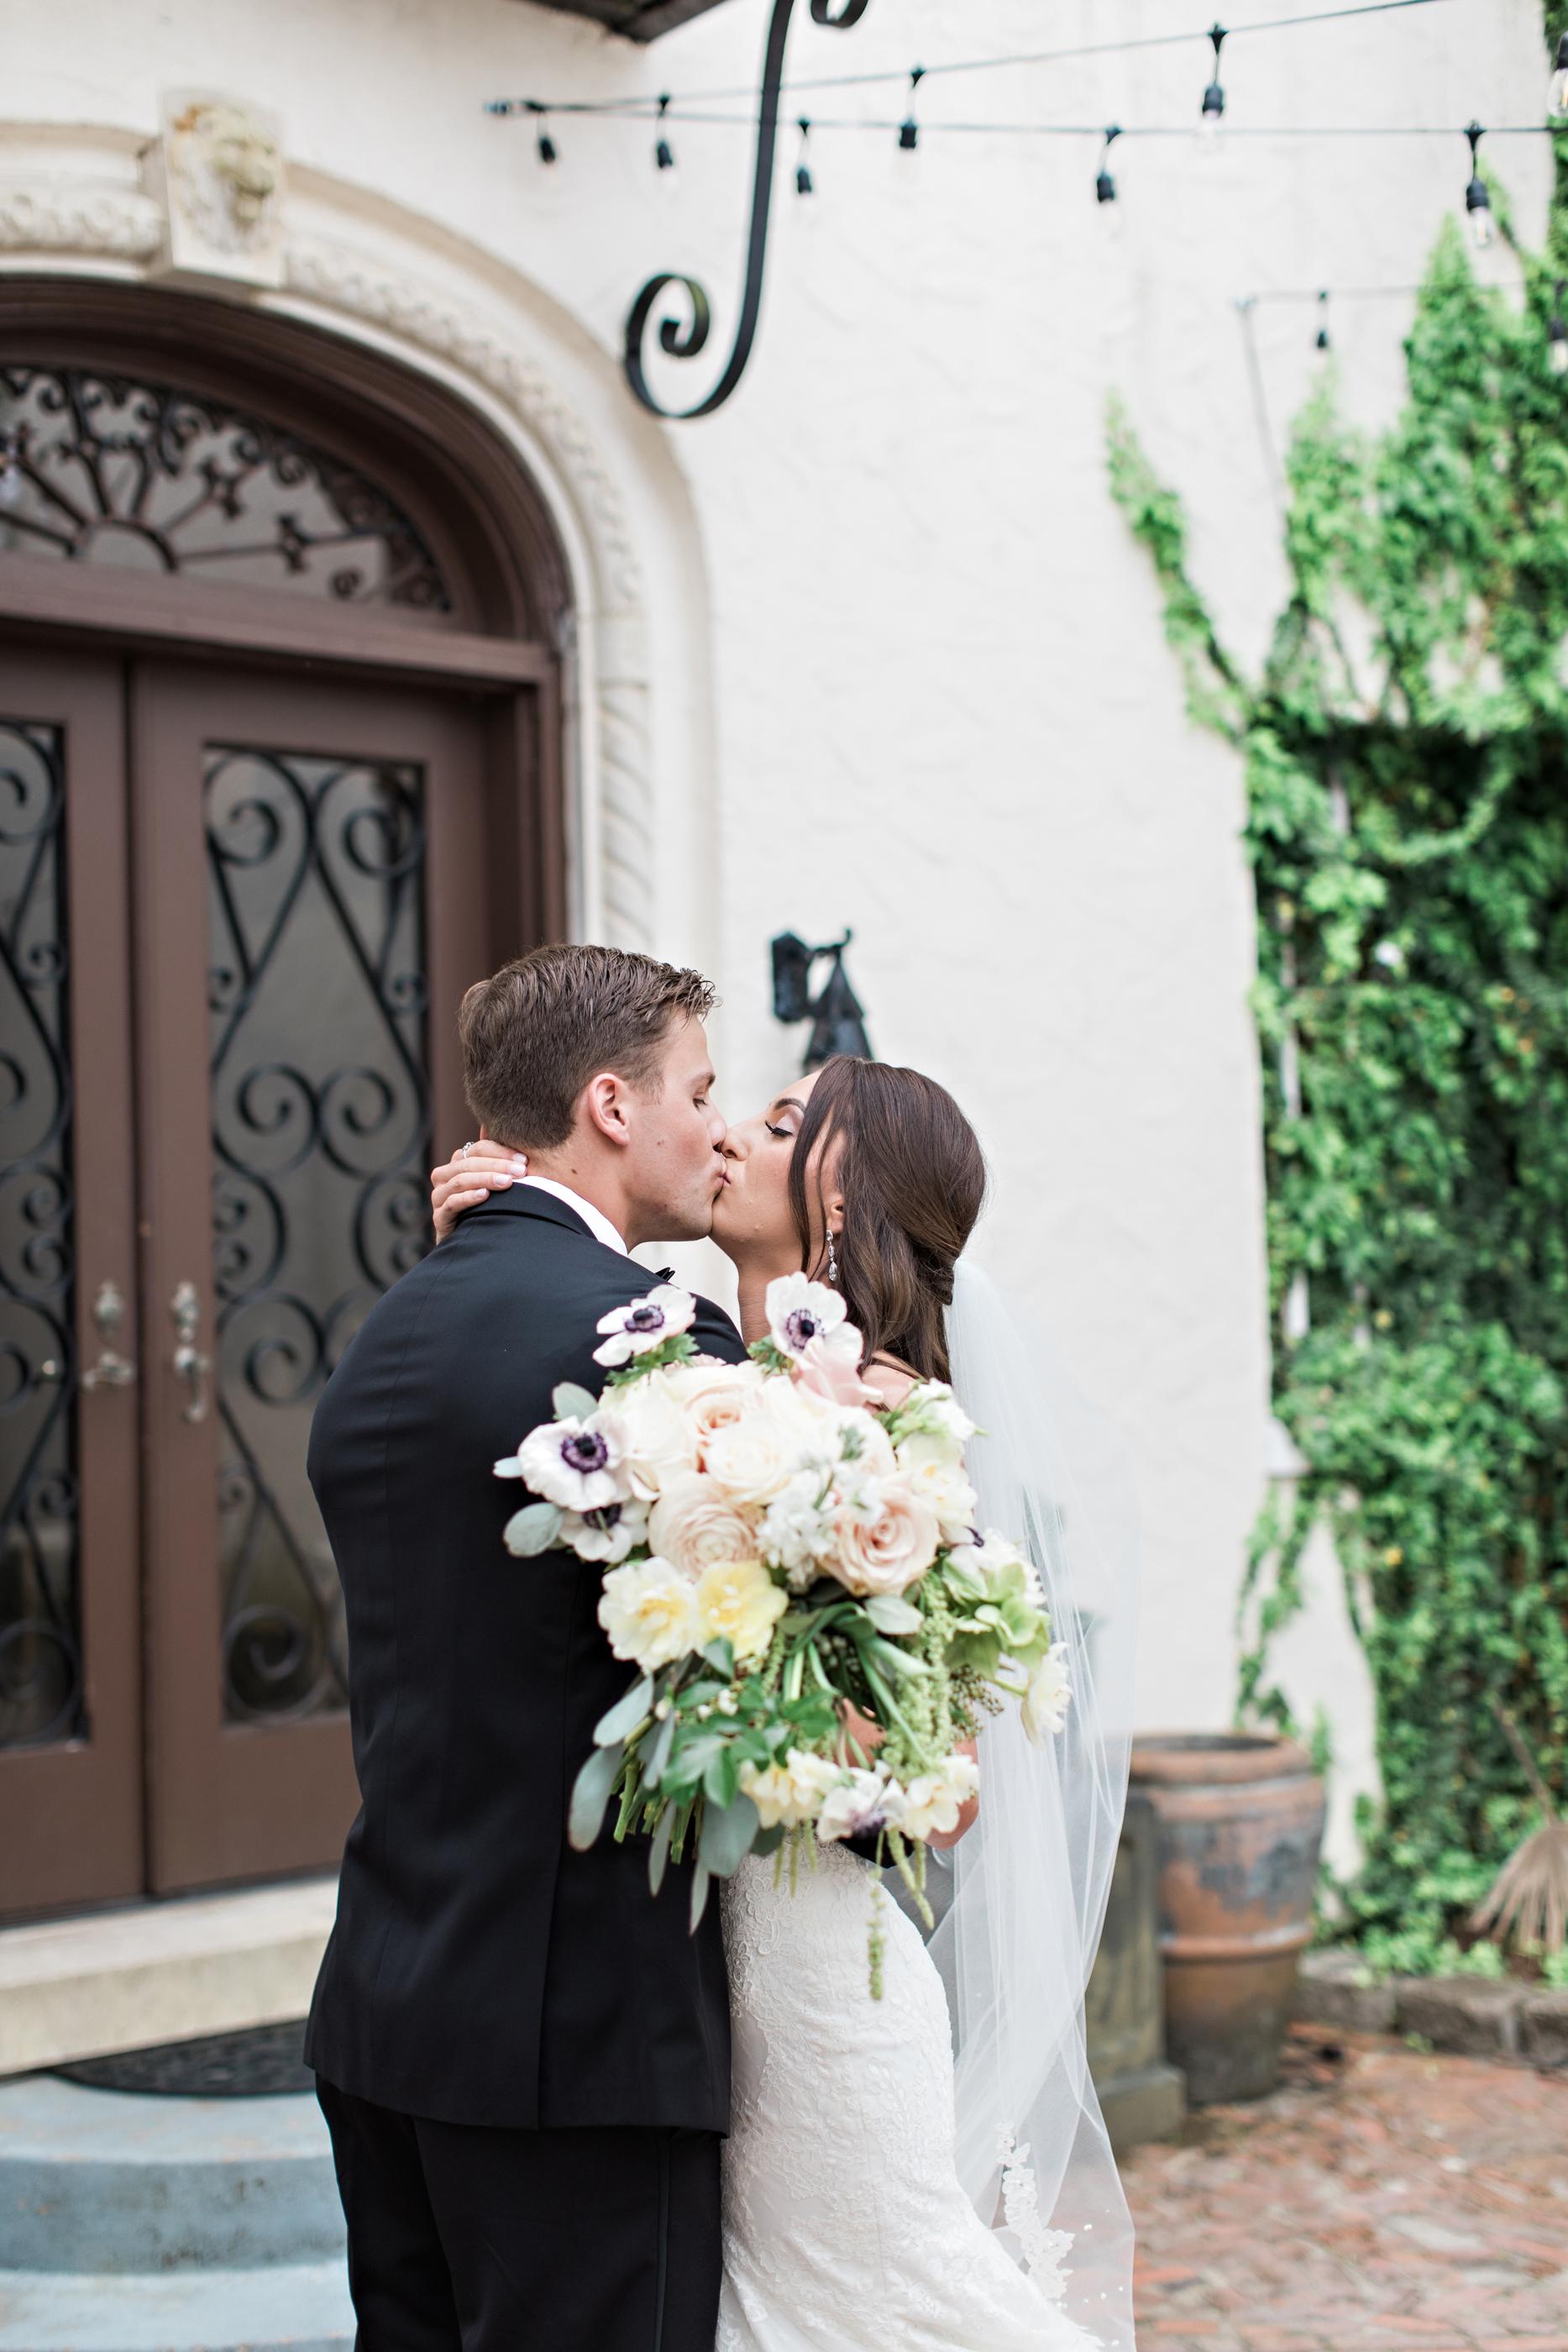 Matty-Drollette-Montgomery-Alabama-Wedding-Photography-122.jpg